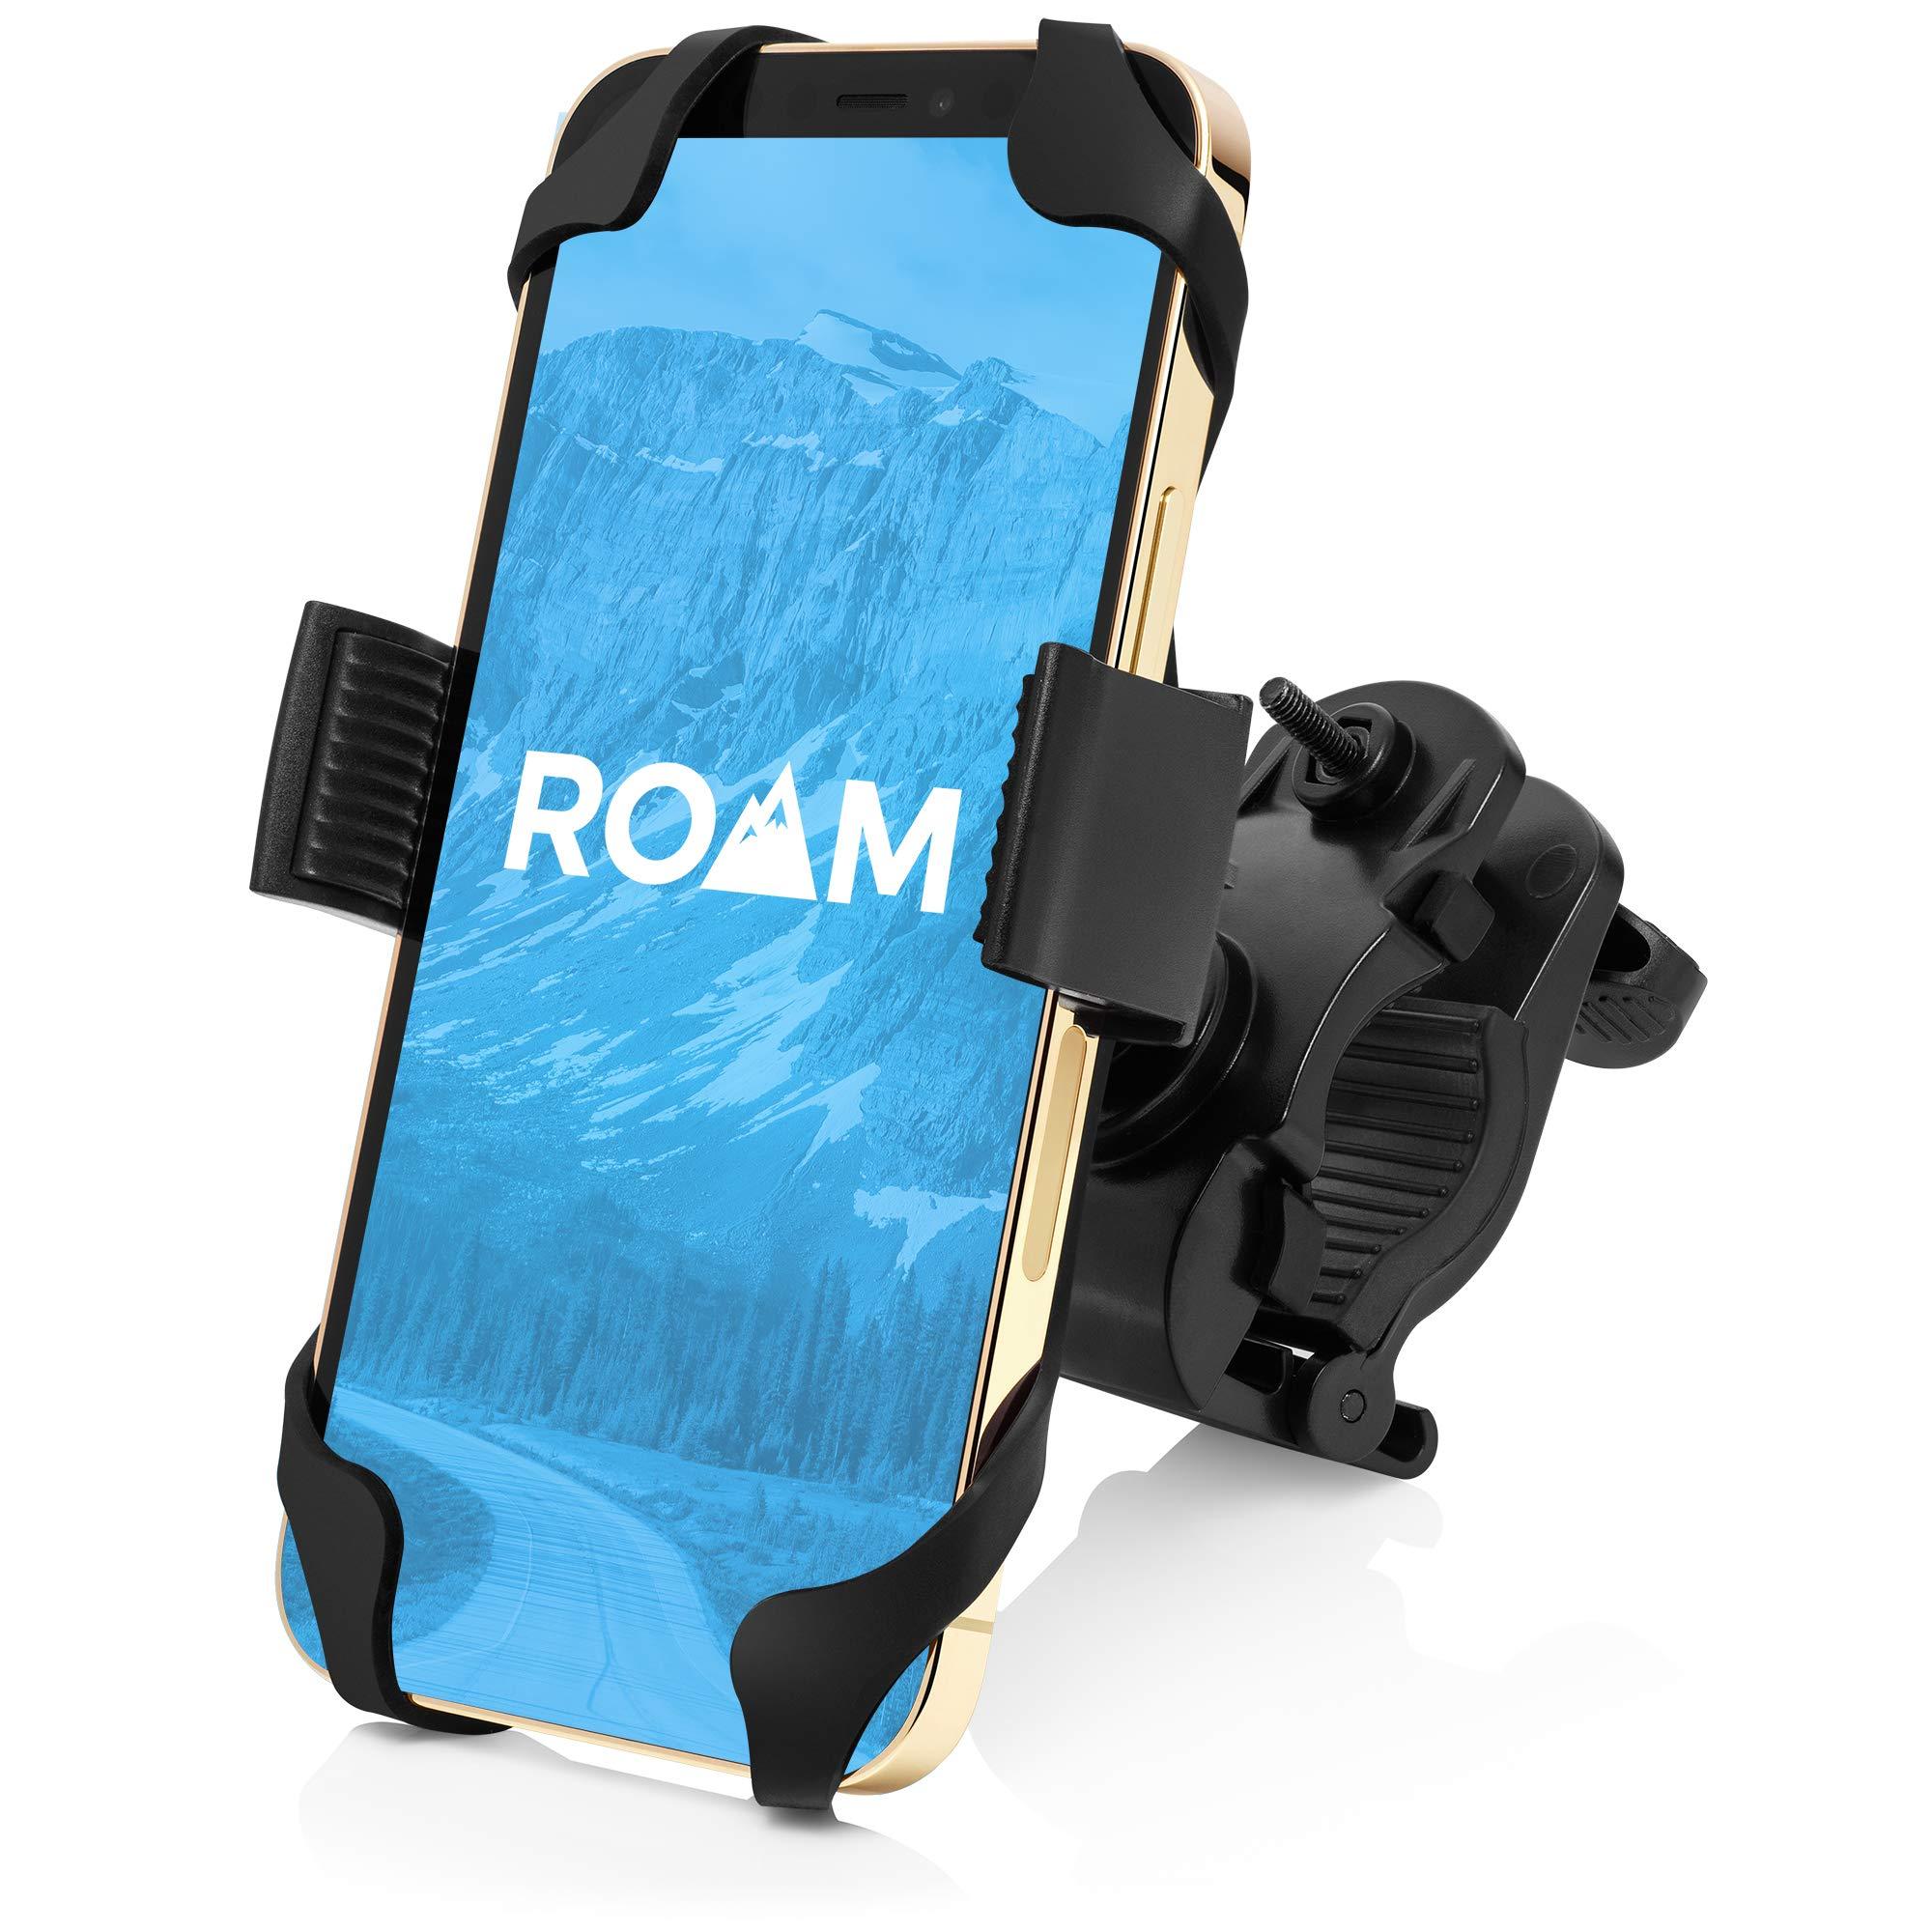 "Roam Universal Premium Bike Phone Mount for Motorcycle - Bike Handlebars, Adjustable, Fits iPhone 7 | 7 Plus, 8 | 8 Plus, iPhone 6s | 6s Plus, Galaxy S7, S6, S5, Holds Phones Up to 3.5"" Wide"